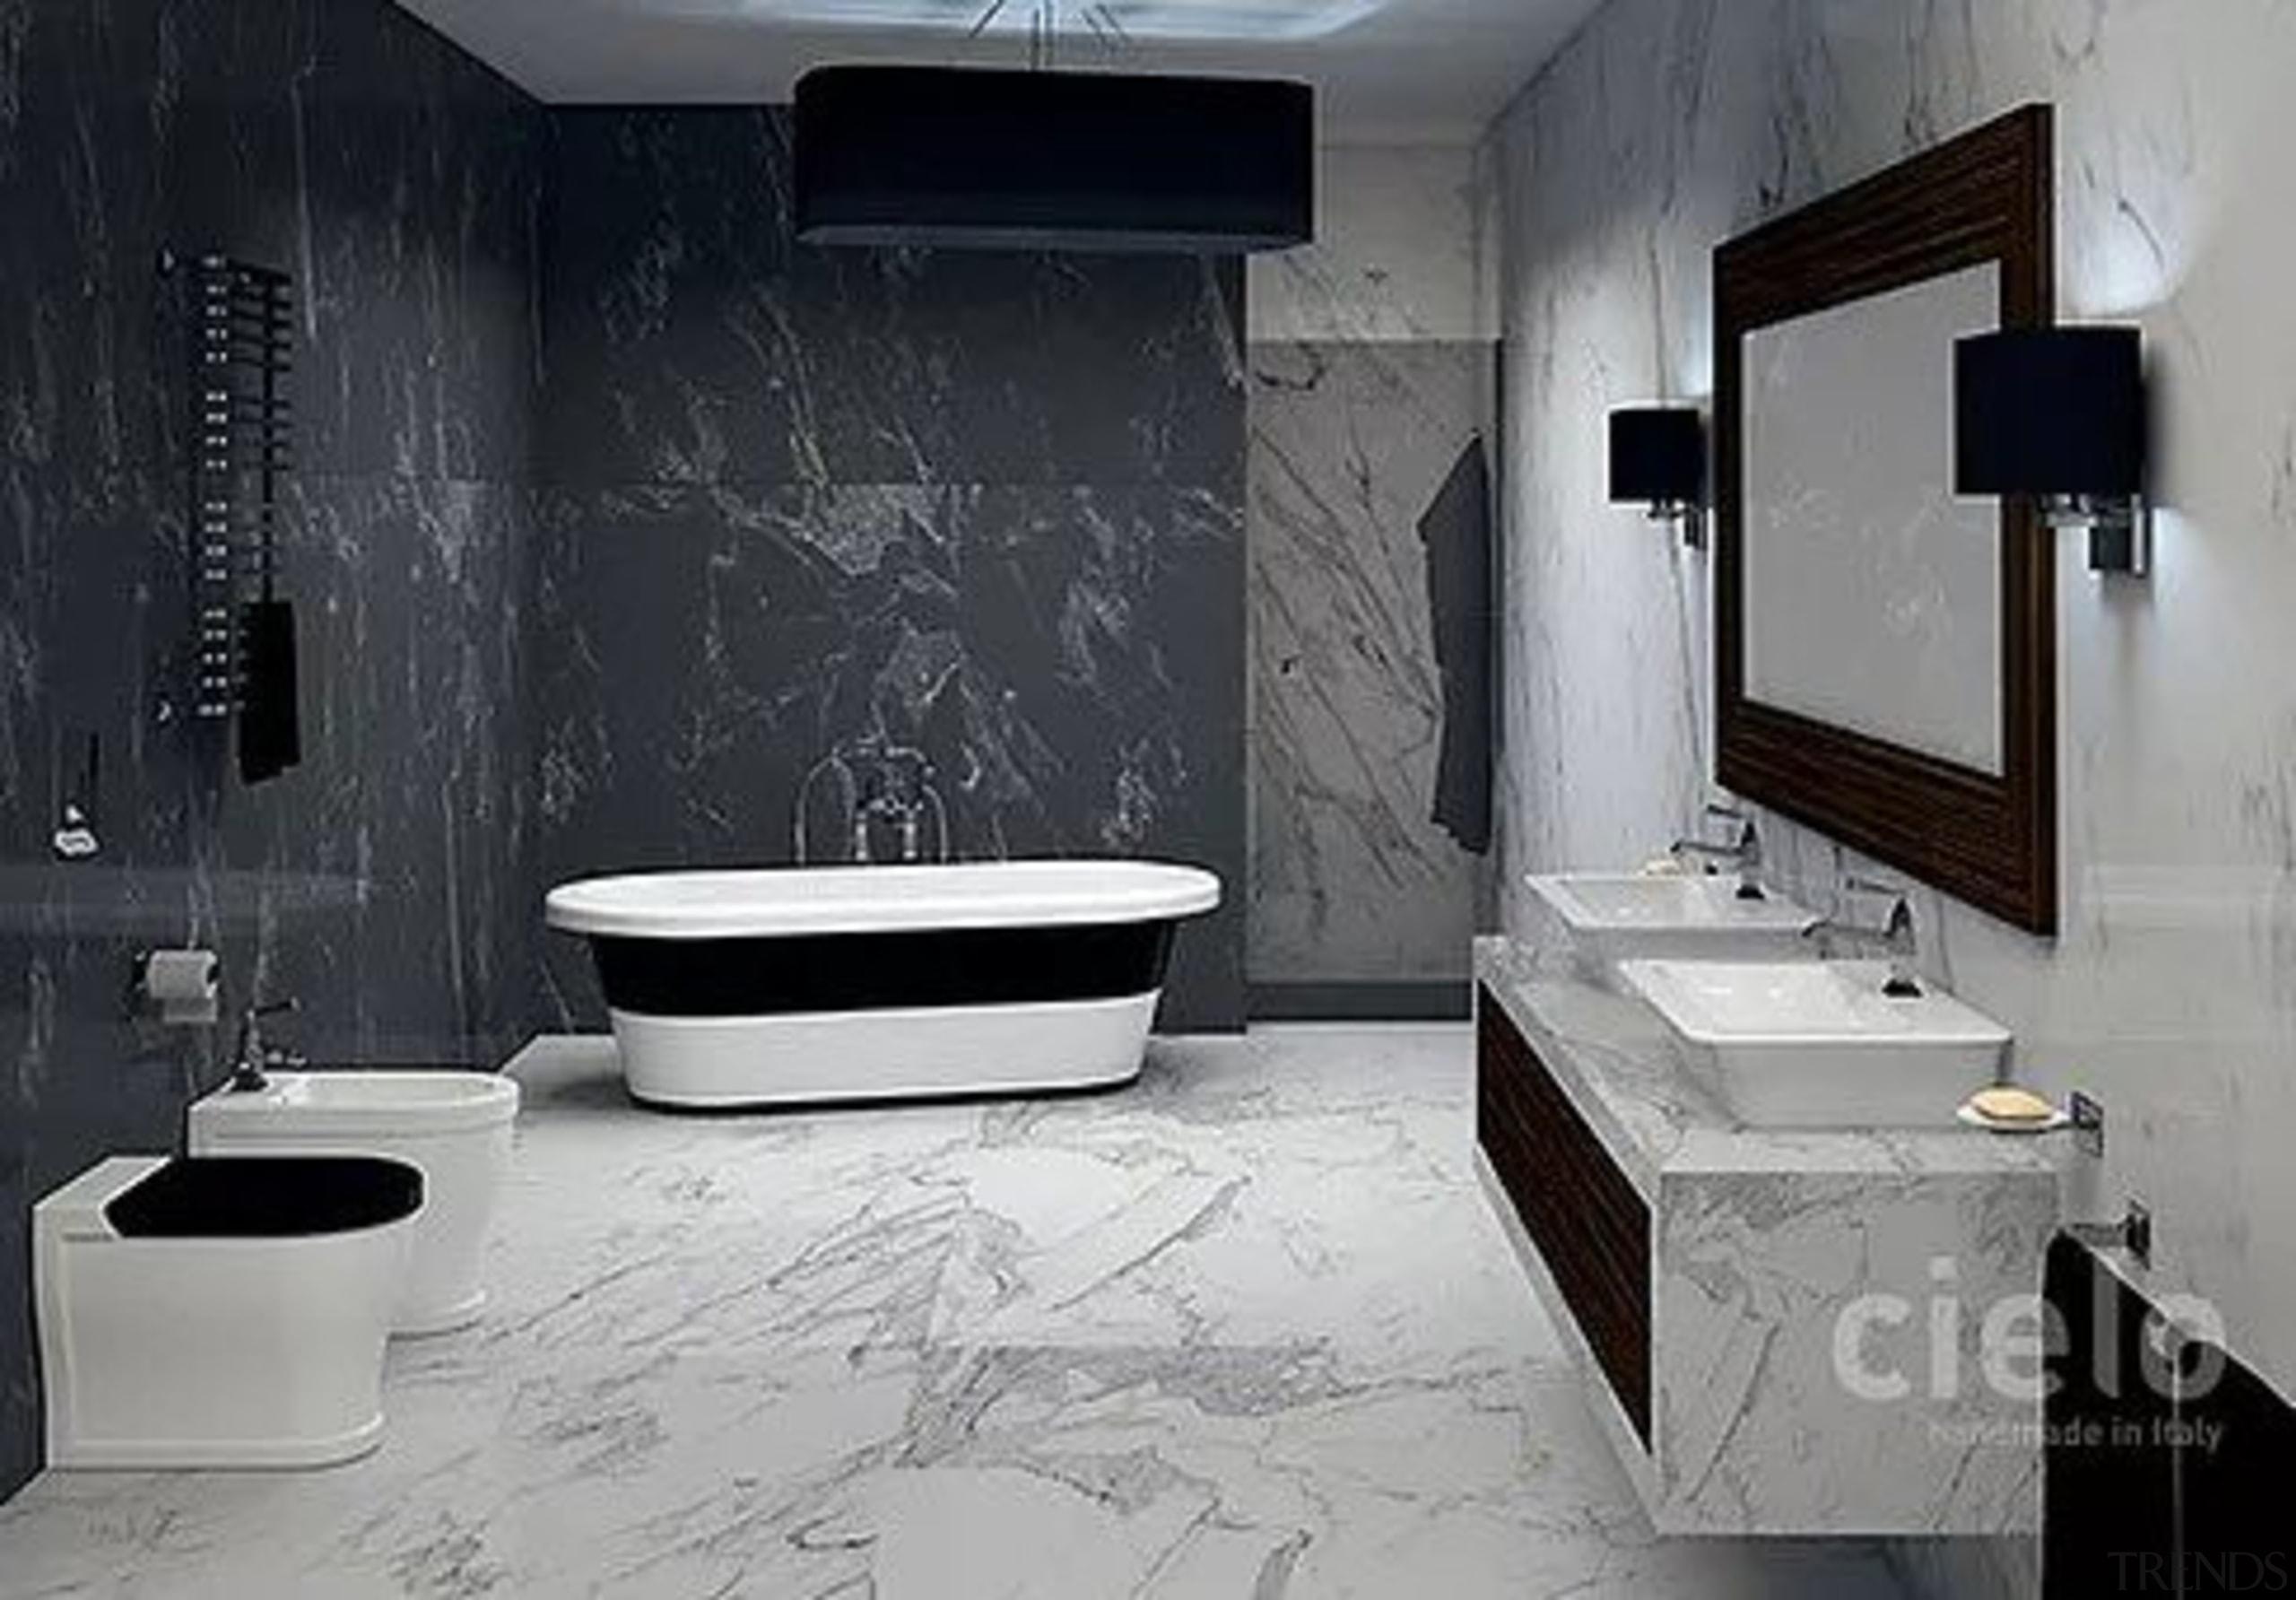 Opera Tonda - Opera Tonda - bathroom | bathroom, black, floor, interior design, plumbing fixture, product design, room, tile, toilet, wall, gray, black